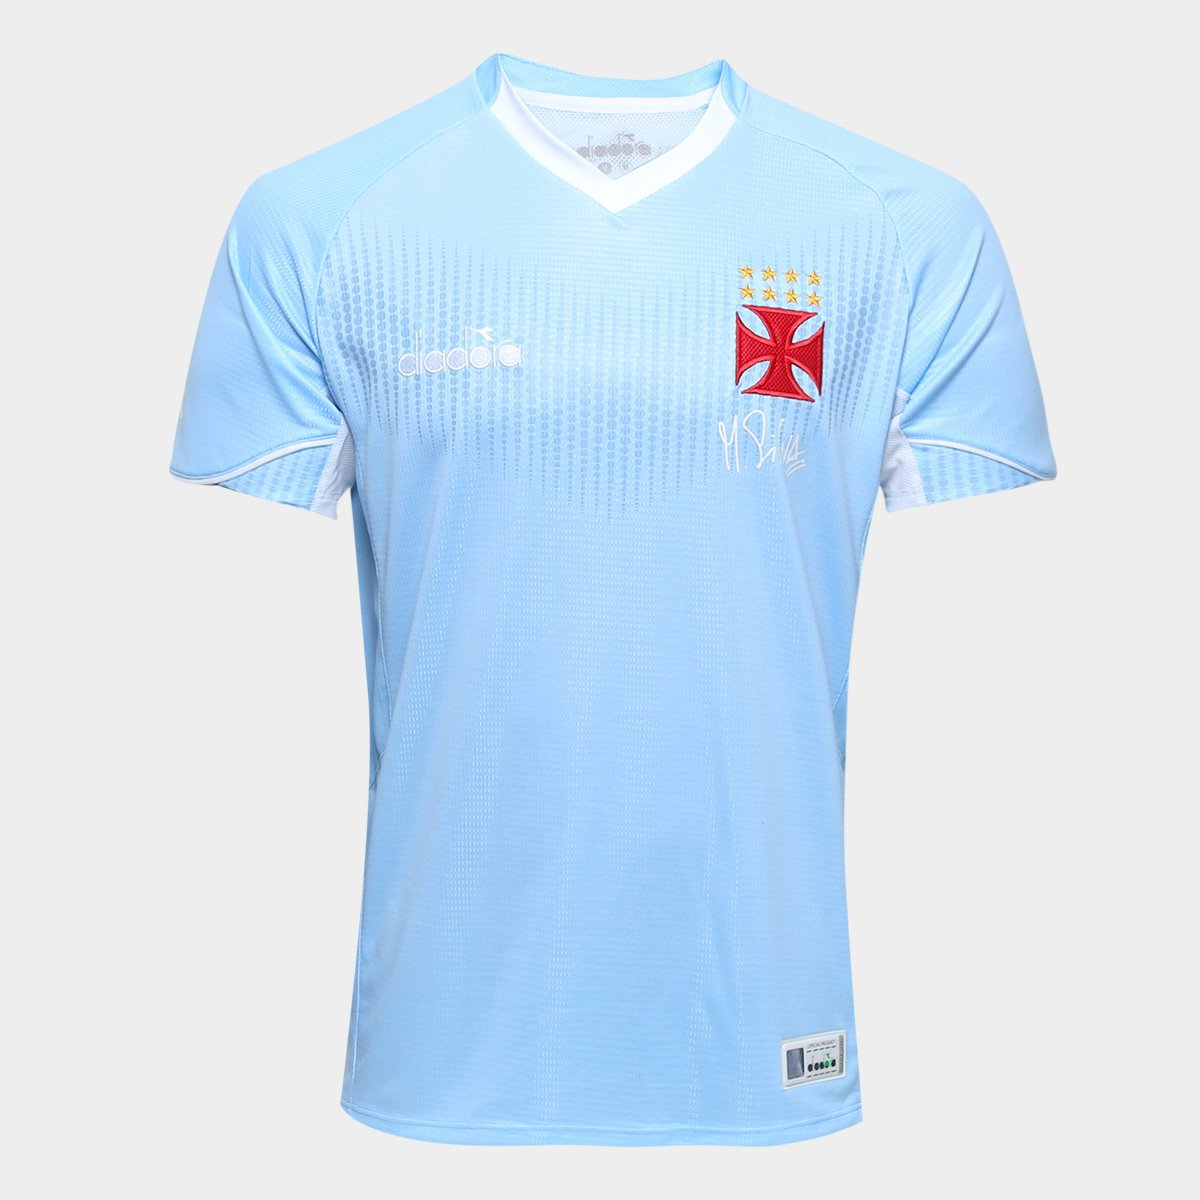 Camisa de Goleiro Vasco I 2018 s n° Torcedor Diadora Masculina ... c8c69315ee91d